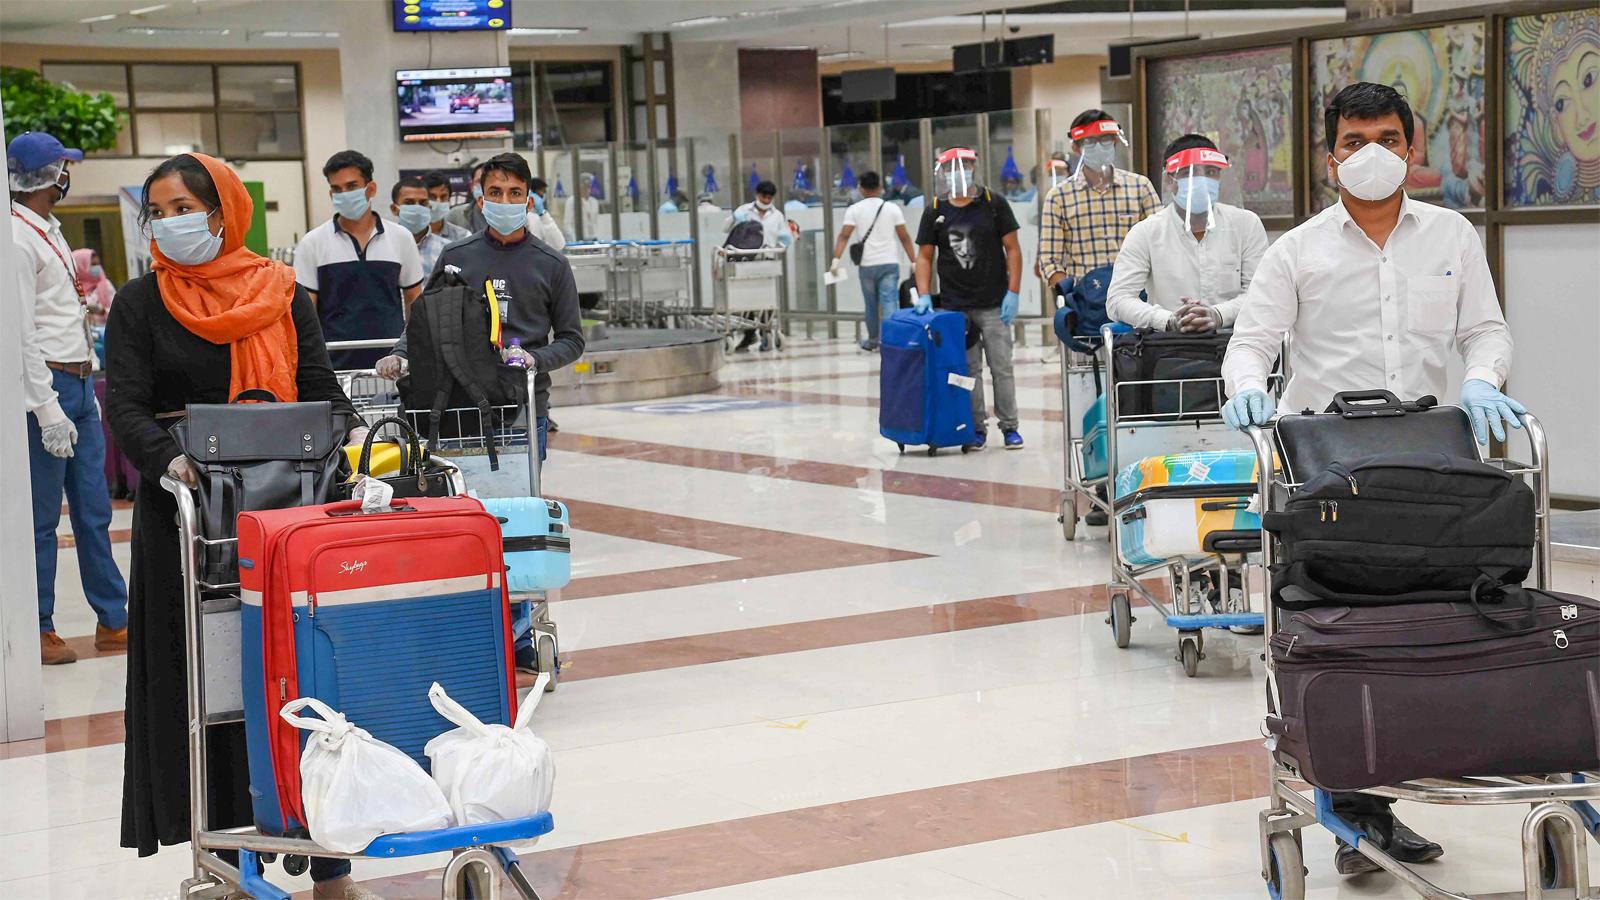 covid-19-seven-days-hotel-quarantine-for-foreign-returnees-says-mha-advisory